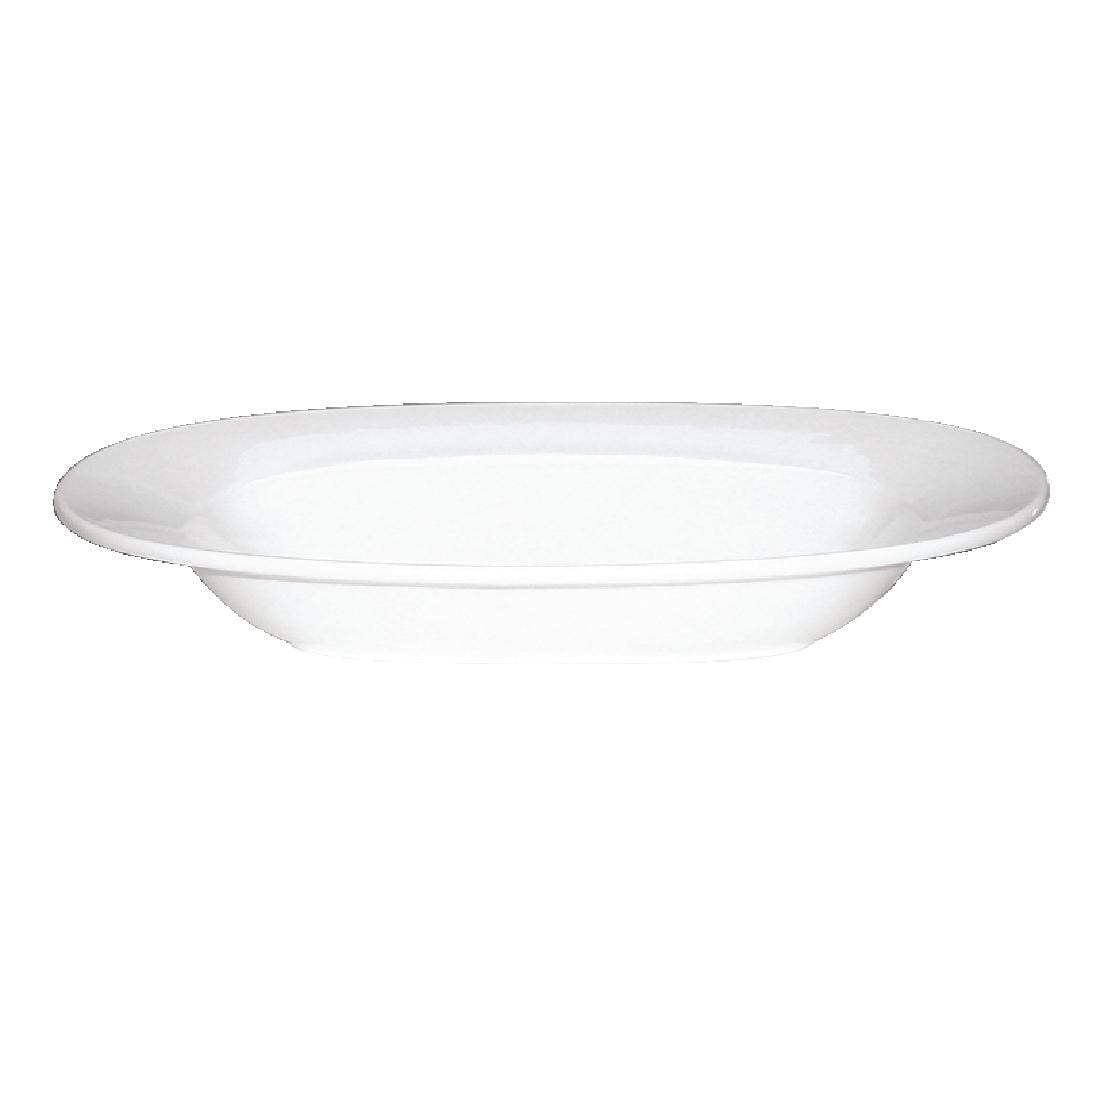 "Alchemy White Oval Pasta Bowl 13"" (Box 6) (Direct)-0"